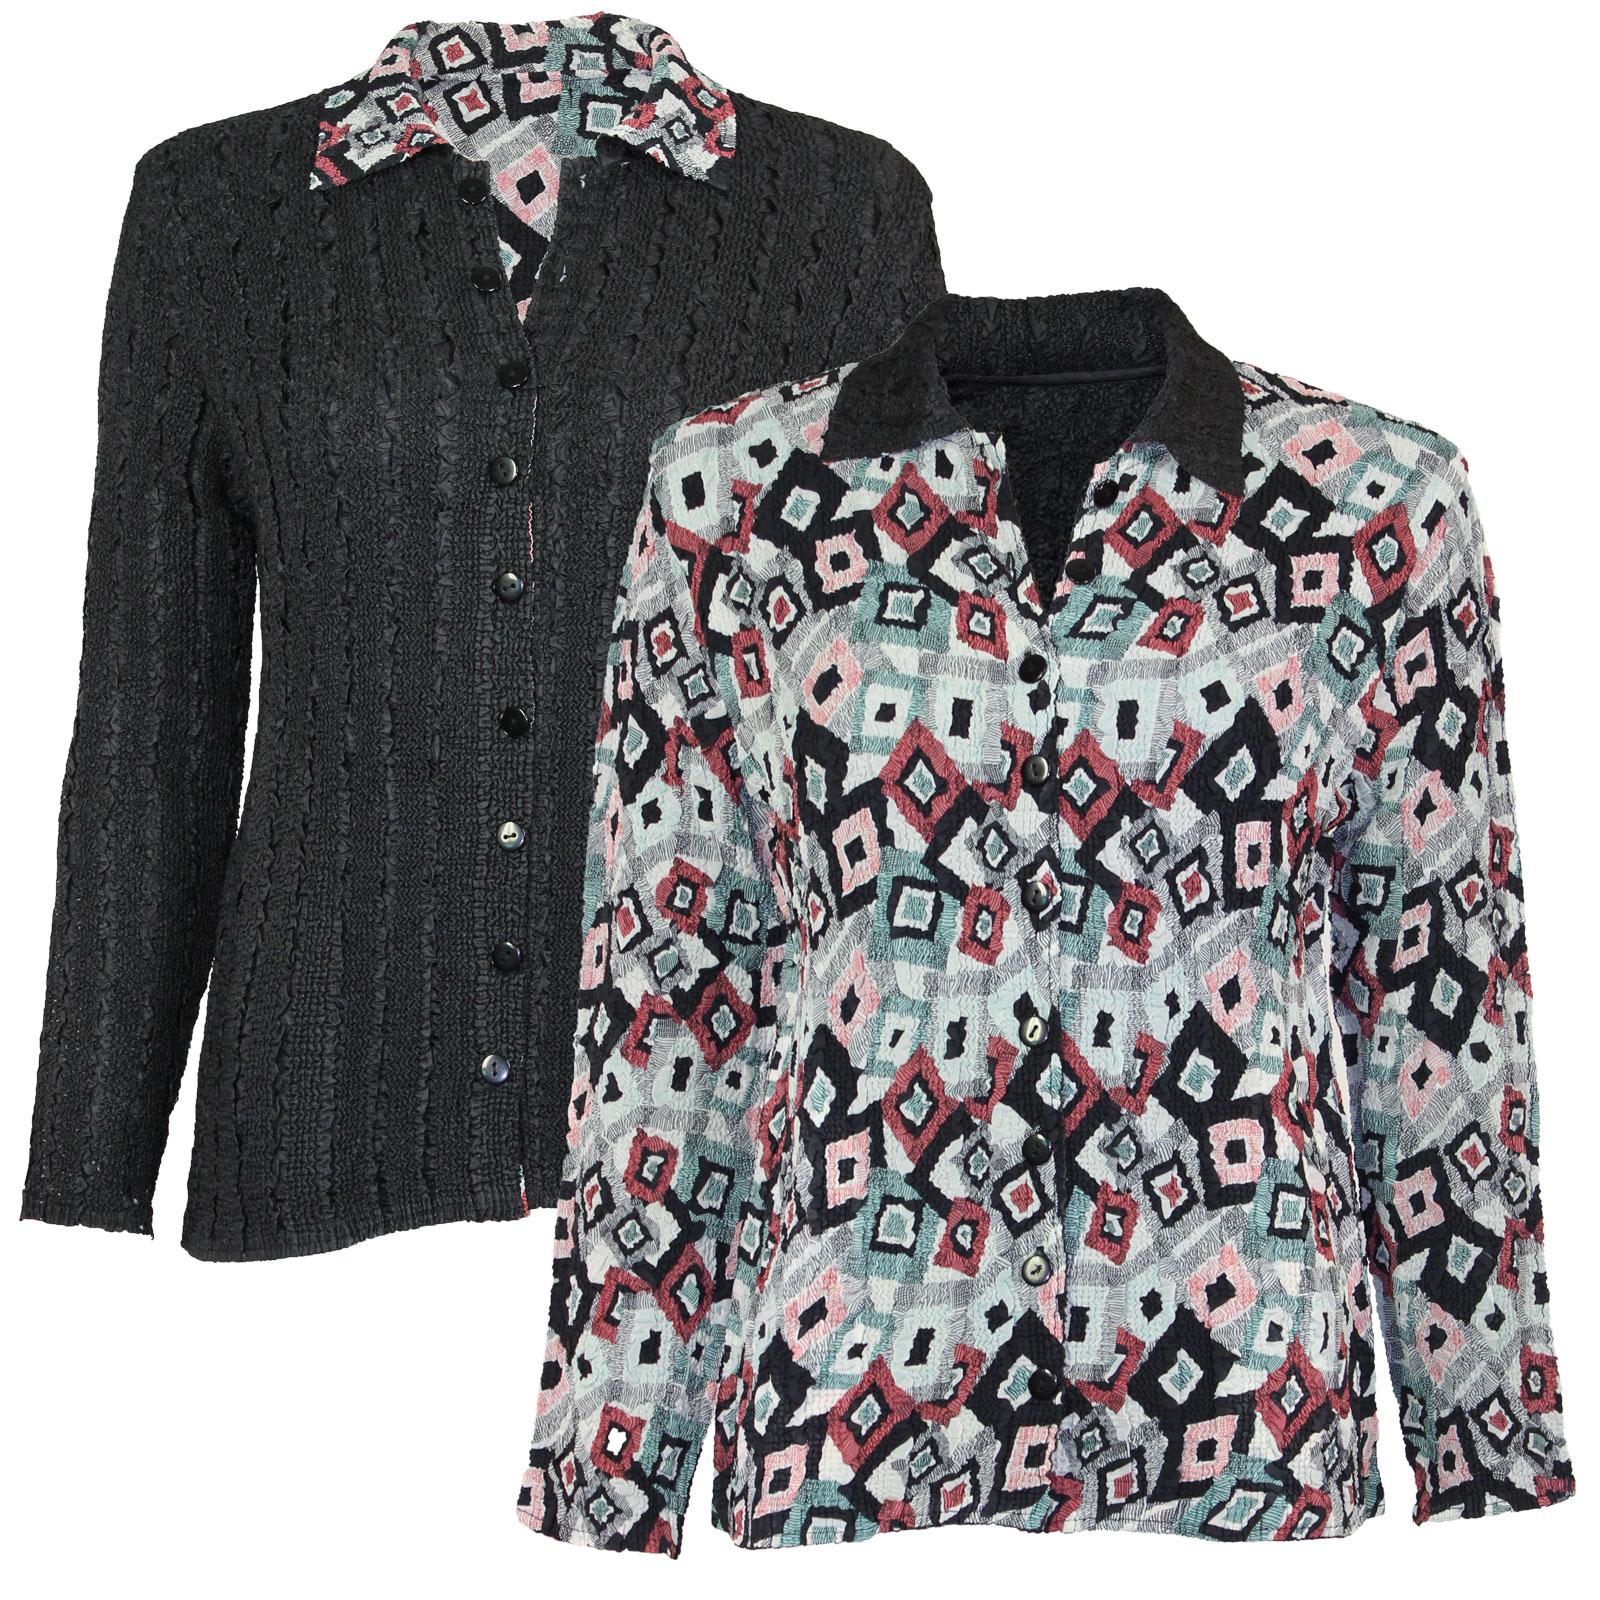 Wholesale Magic Crush - Reversible Jackets #3007 - S-M